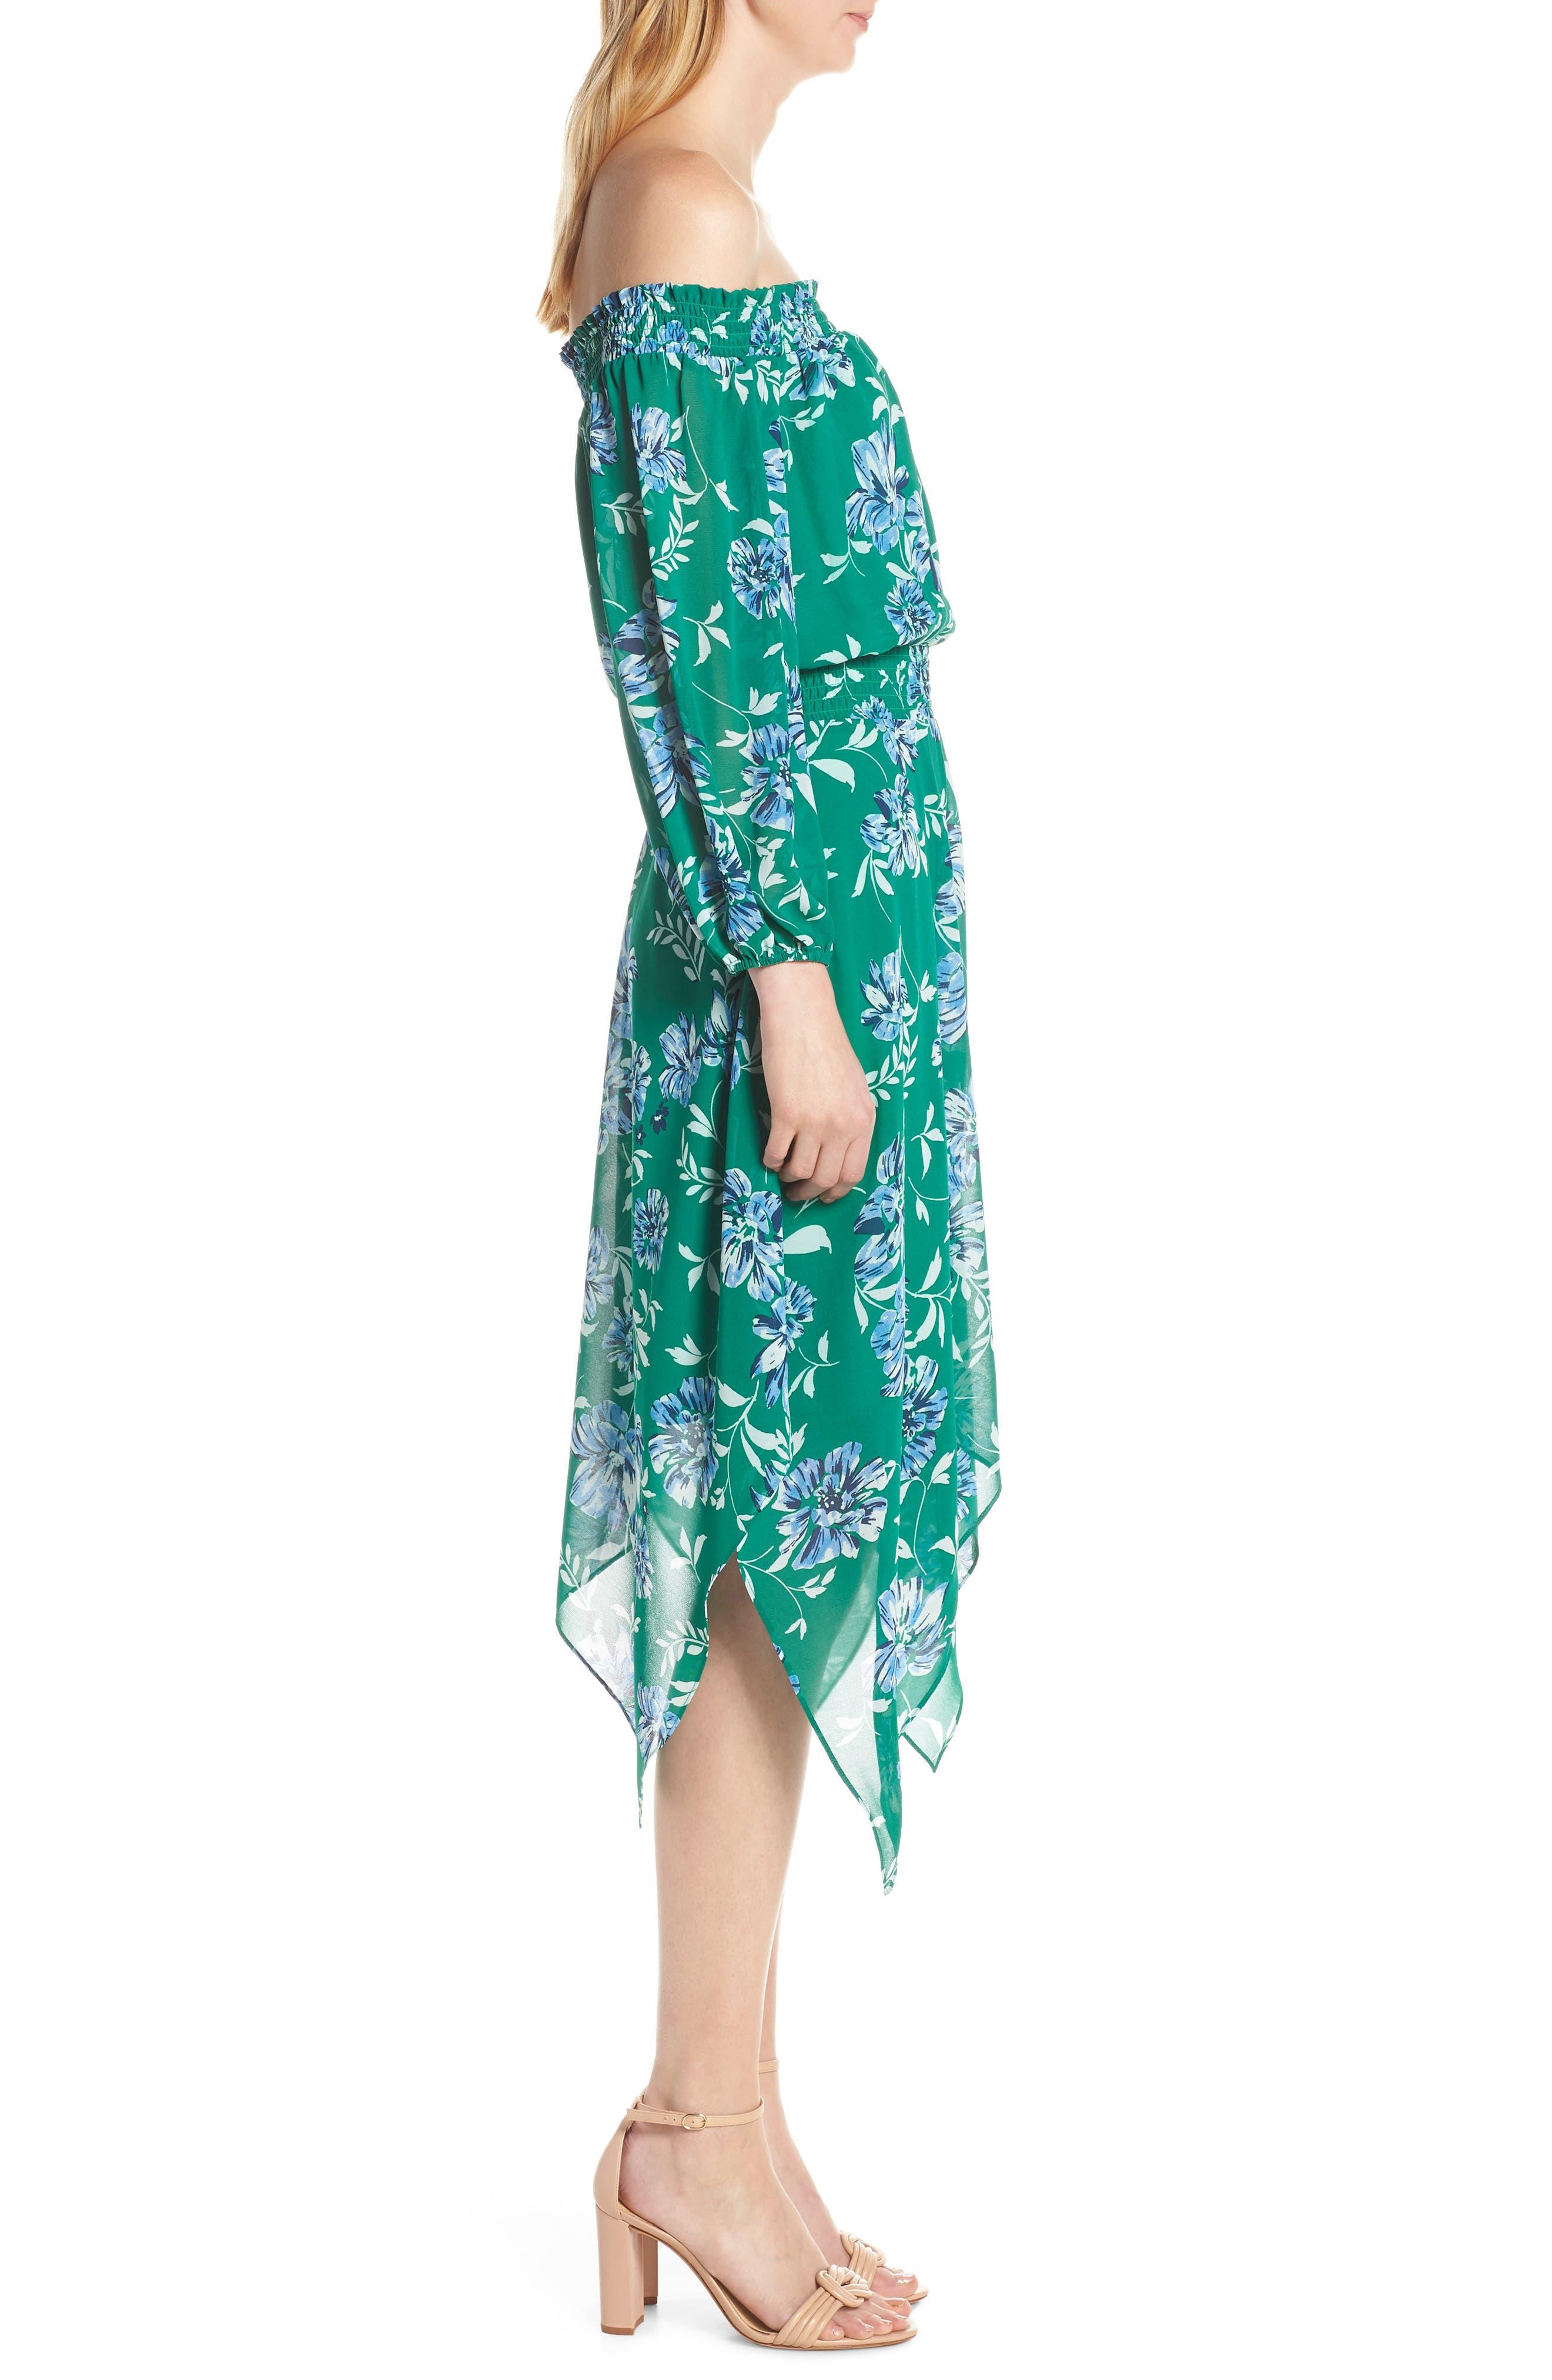 CHARLES HENRY, Smocked Handkerchief Hem Dress, Alternate thumbnail 4, color, KELLY GREEN FLORAL